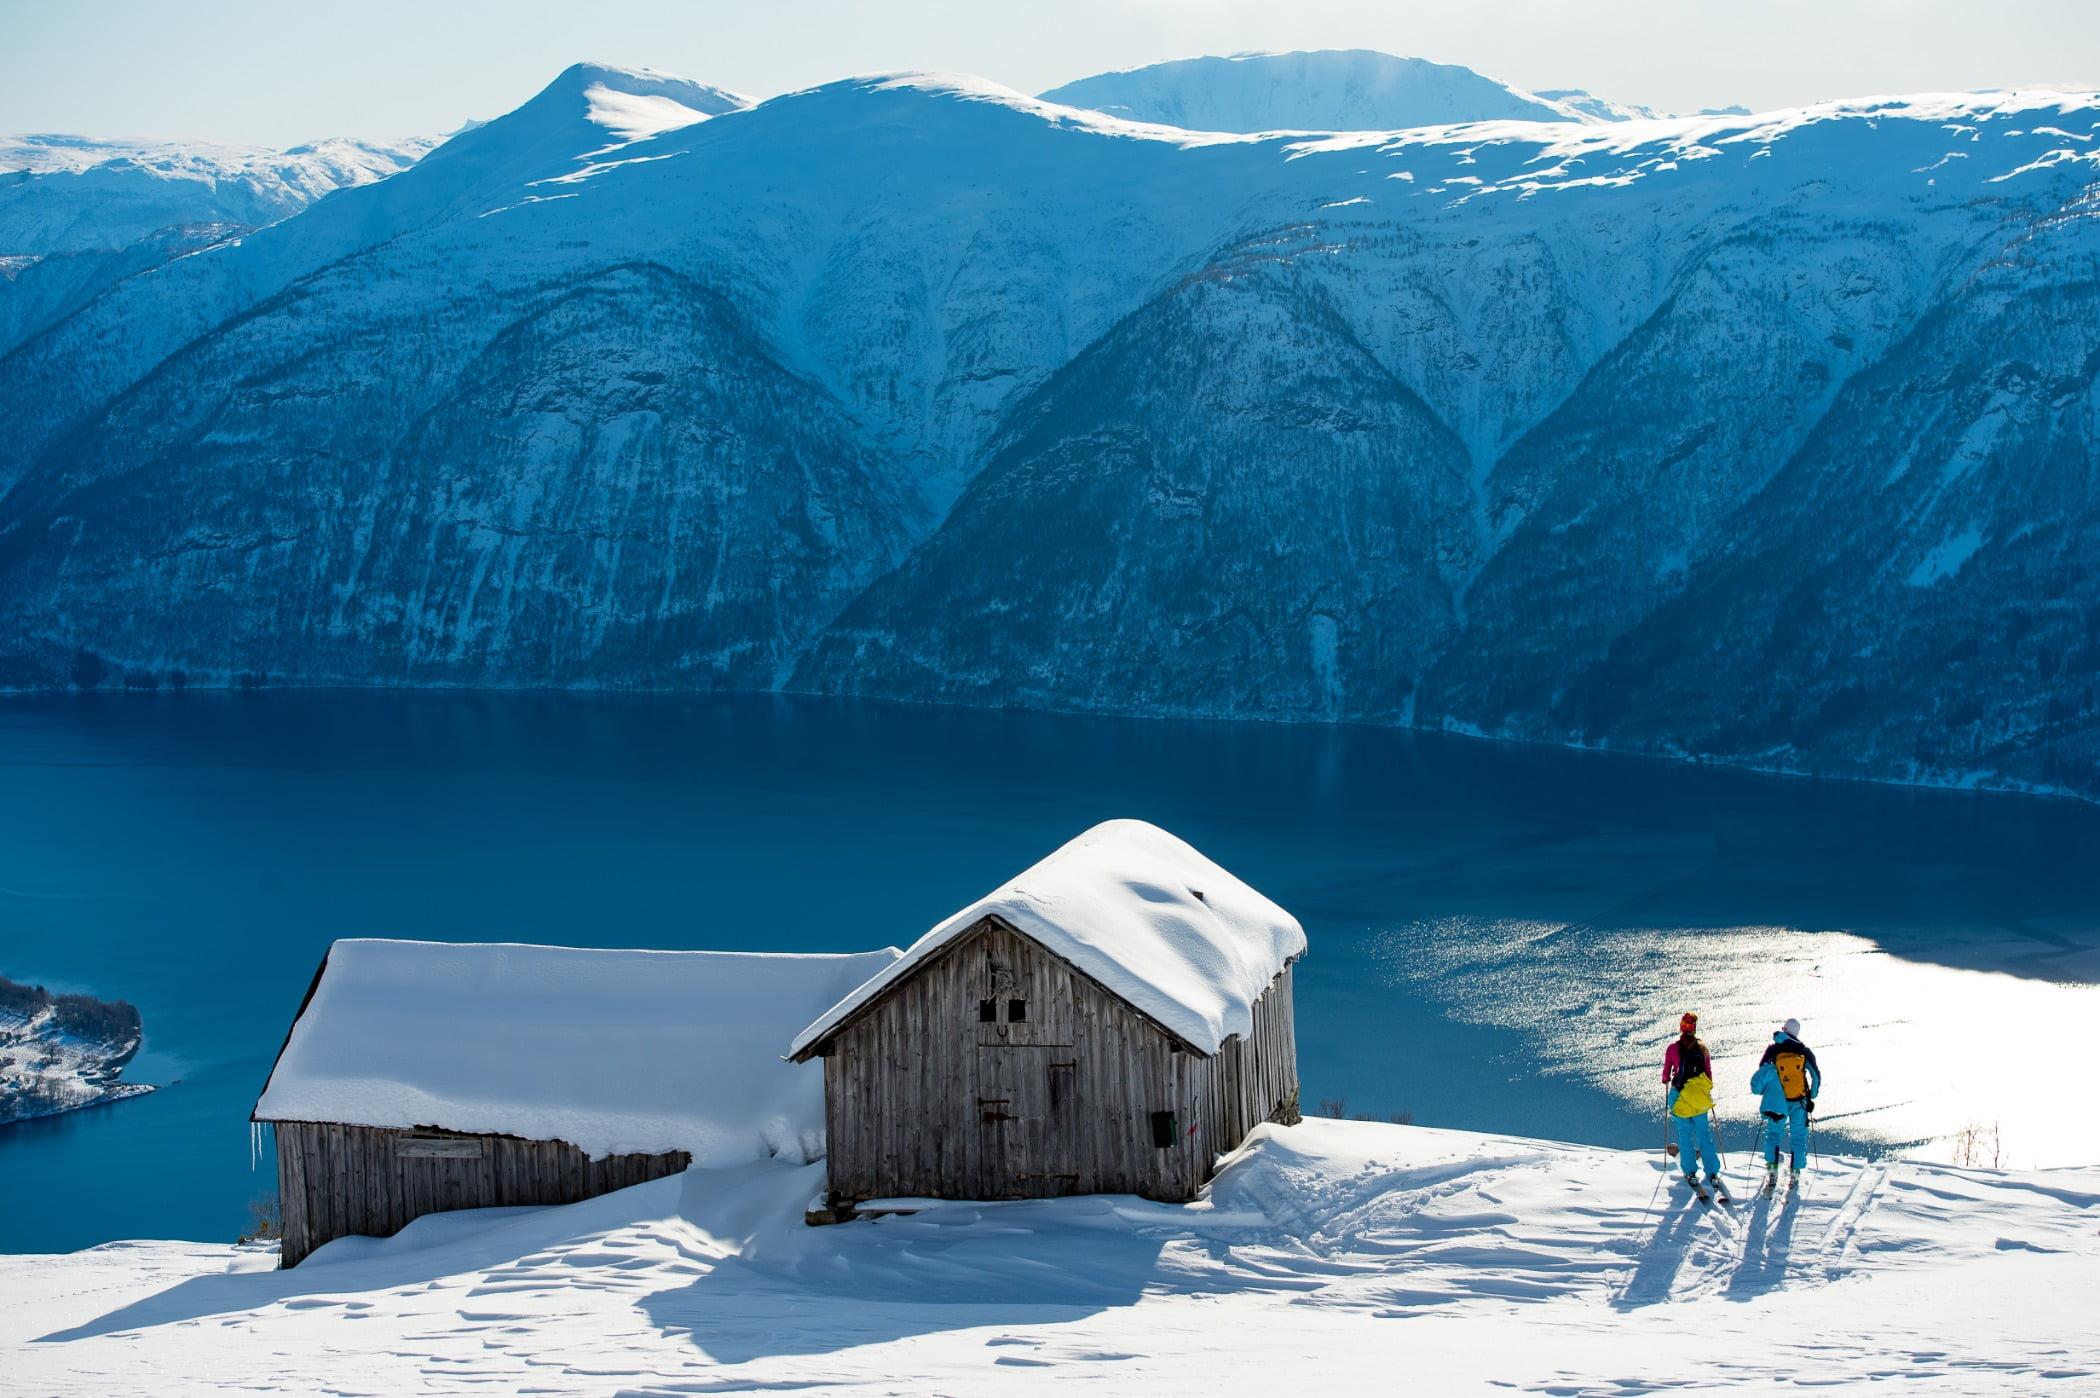 Winter sport, Ice cap, Glacial landform, Mountain range, Mountainous landforms, Freezing, Snow, Slope